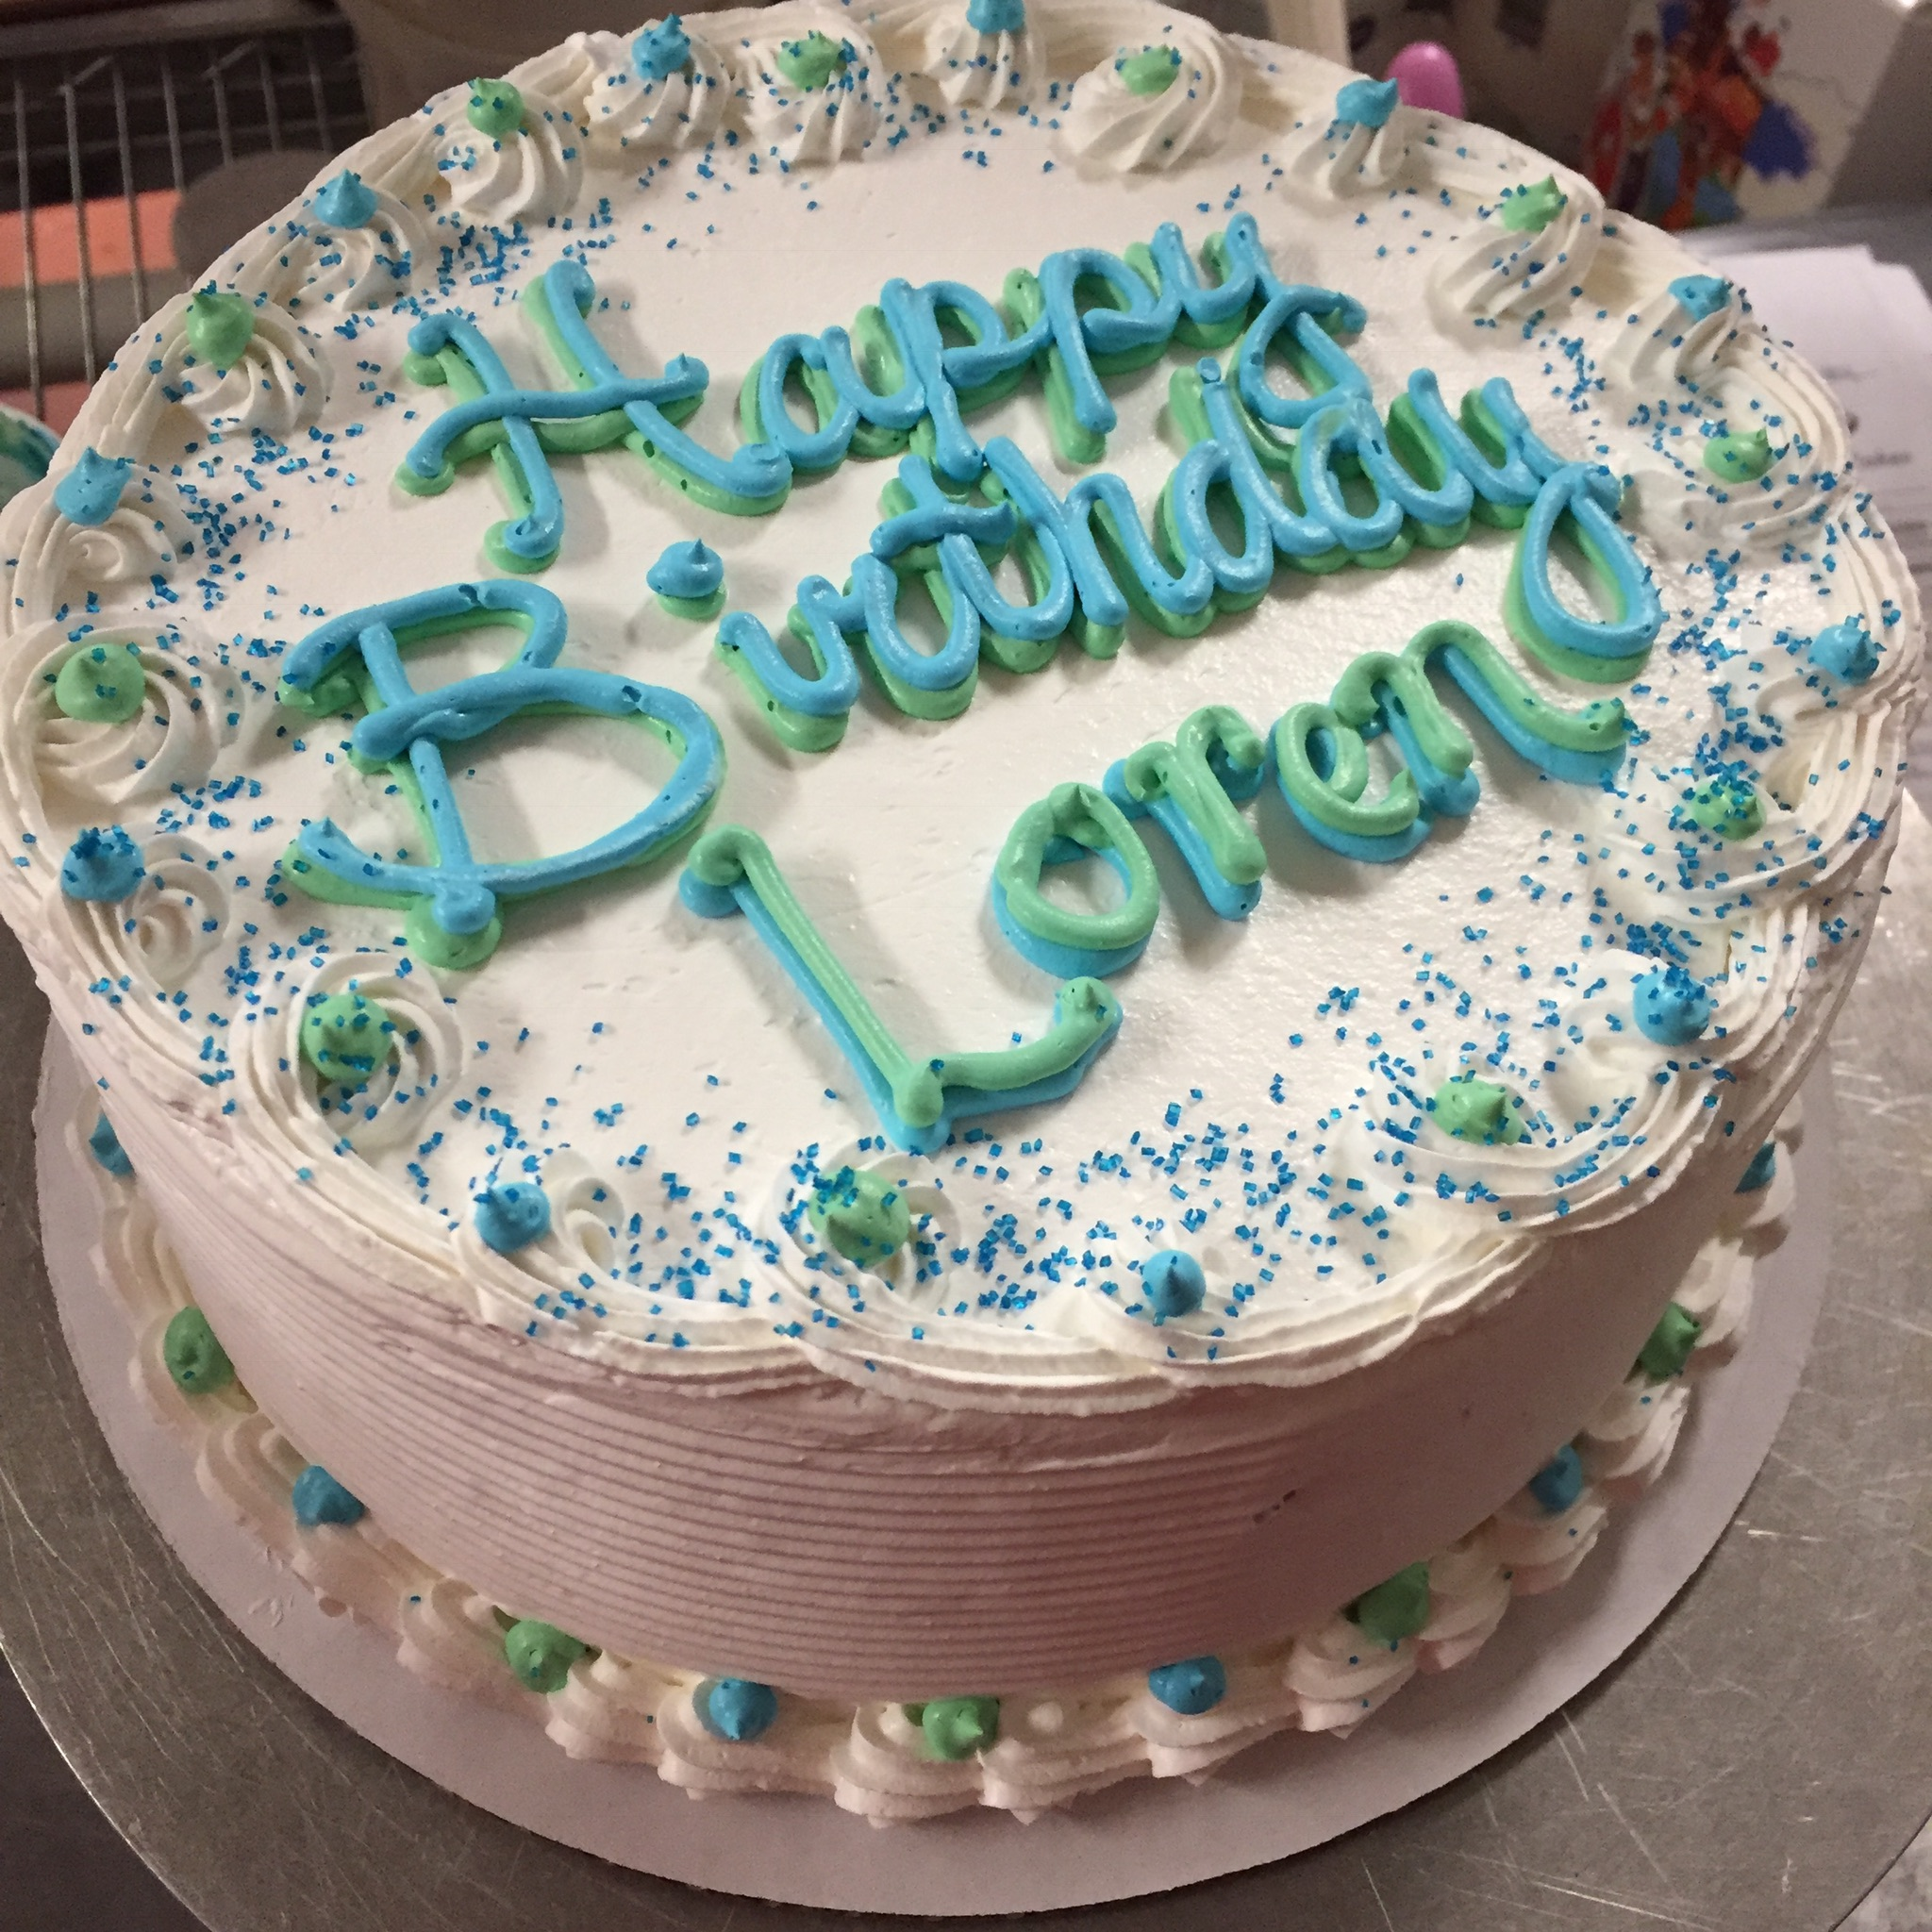 Cake Design #18